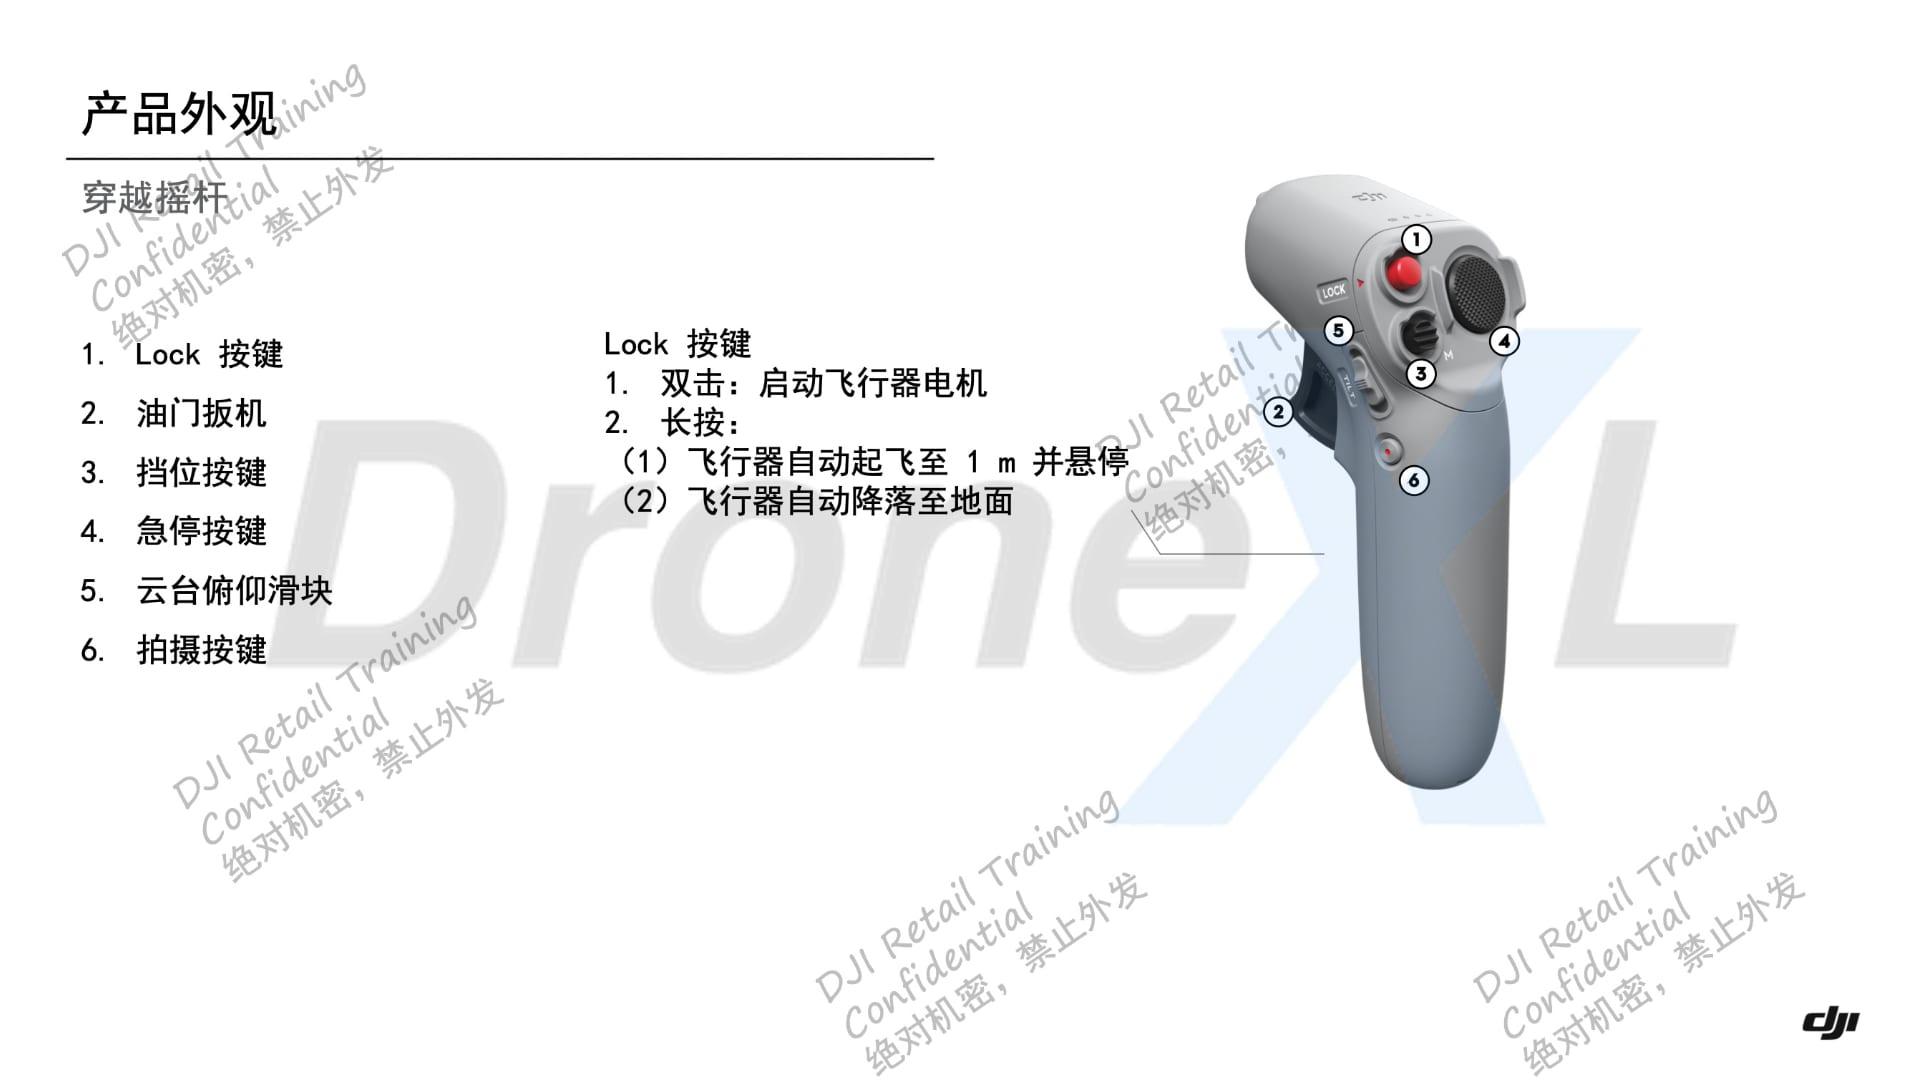 DJI FPV Manual Motion Controller